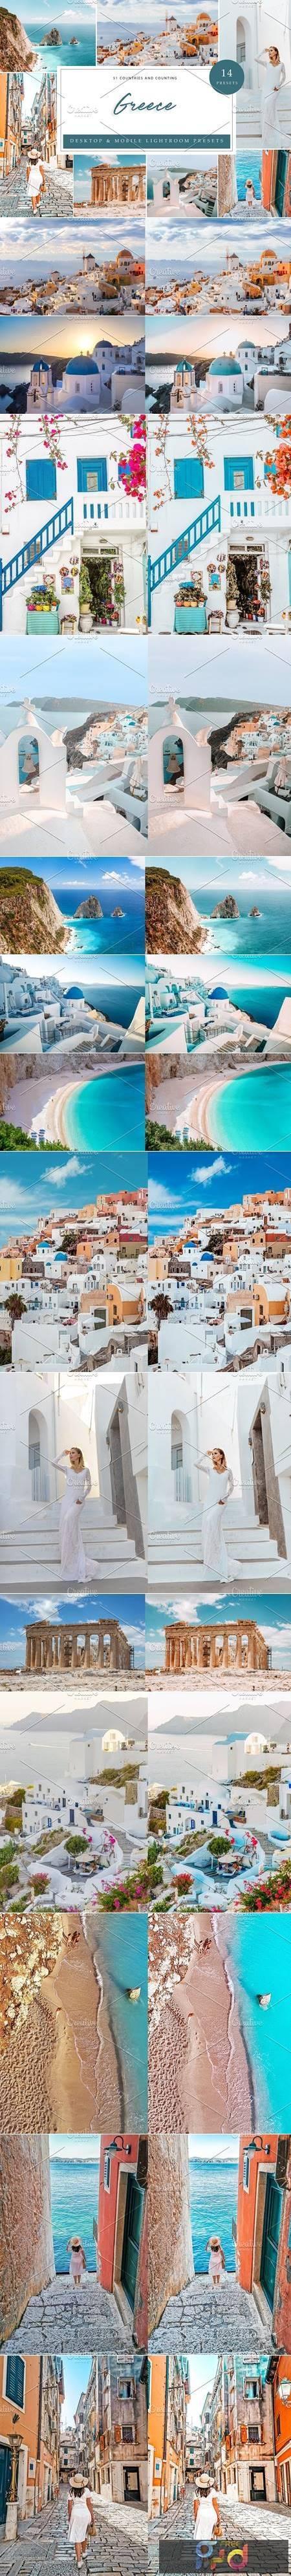 14 x Lightroom Presets, Greece 5962548 1